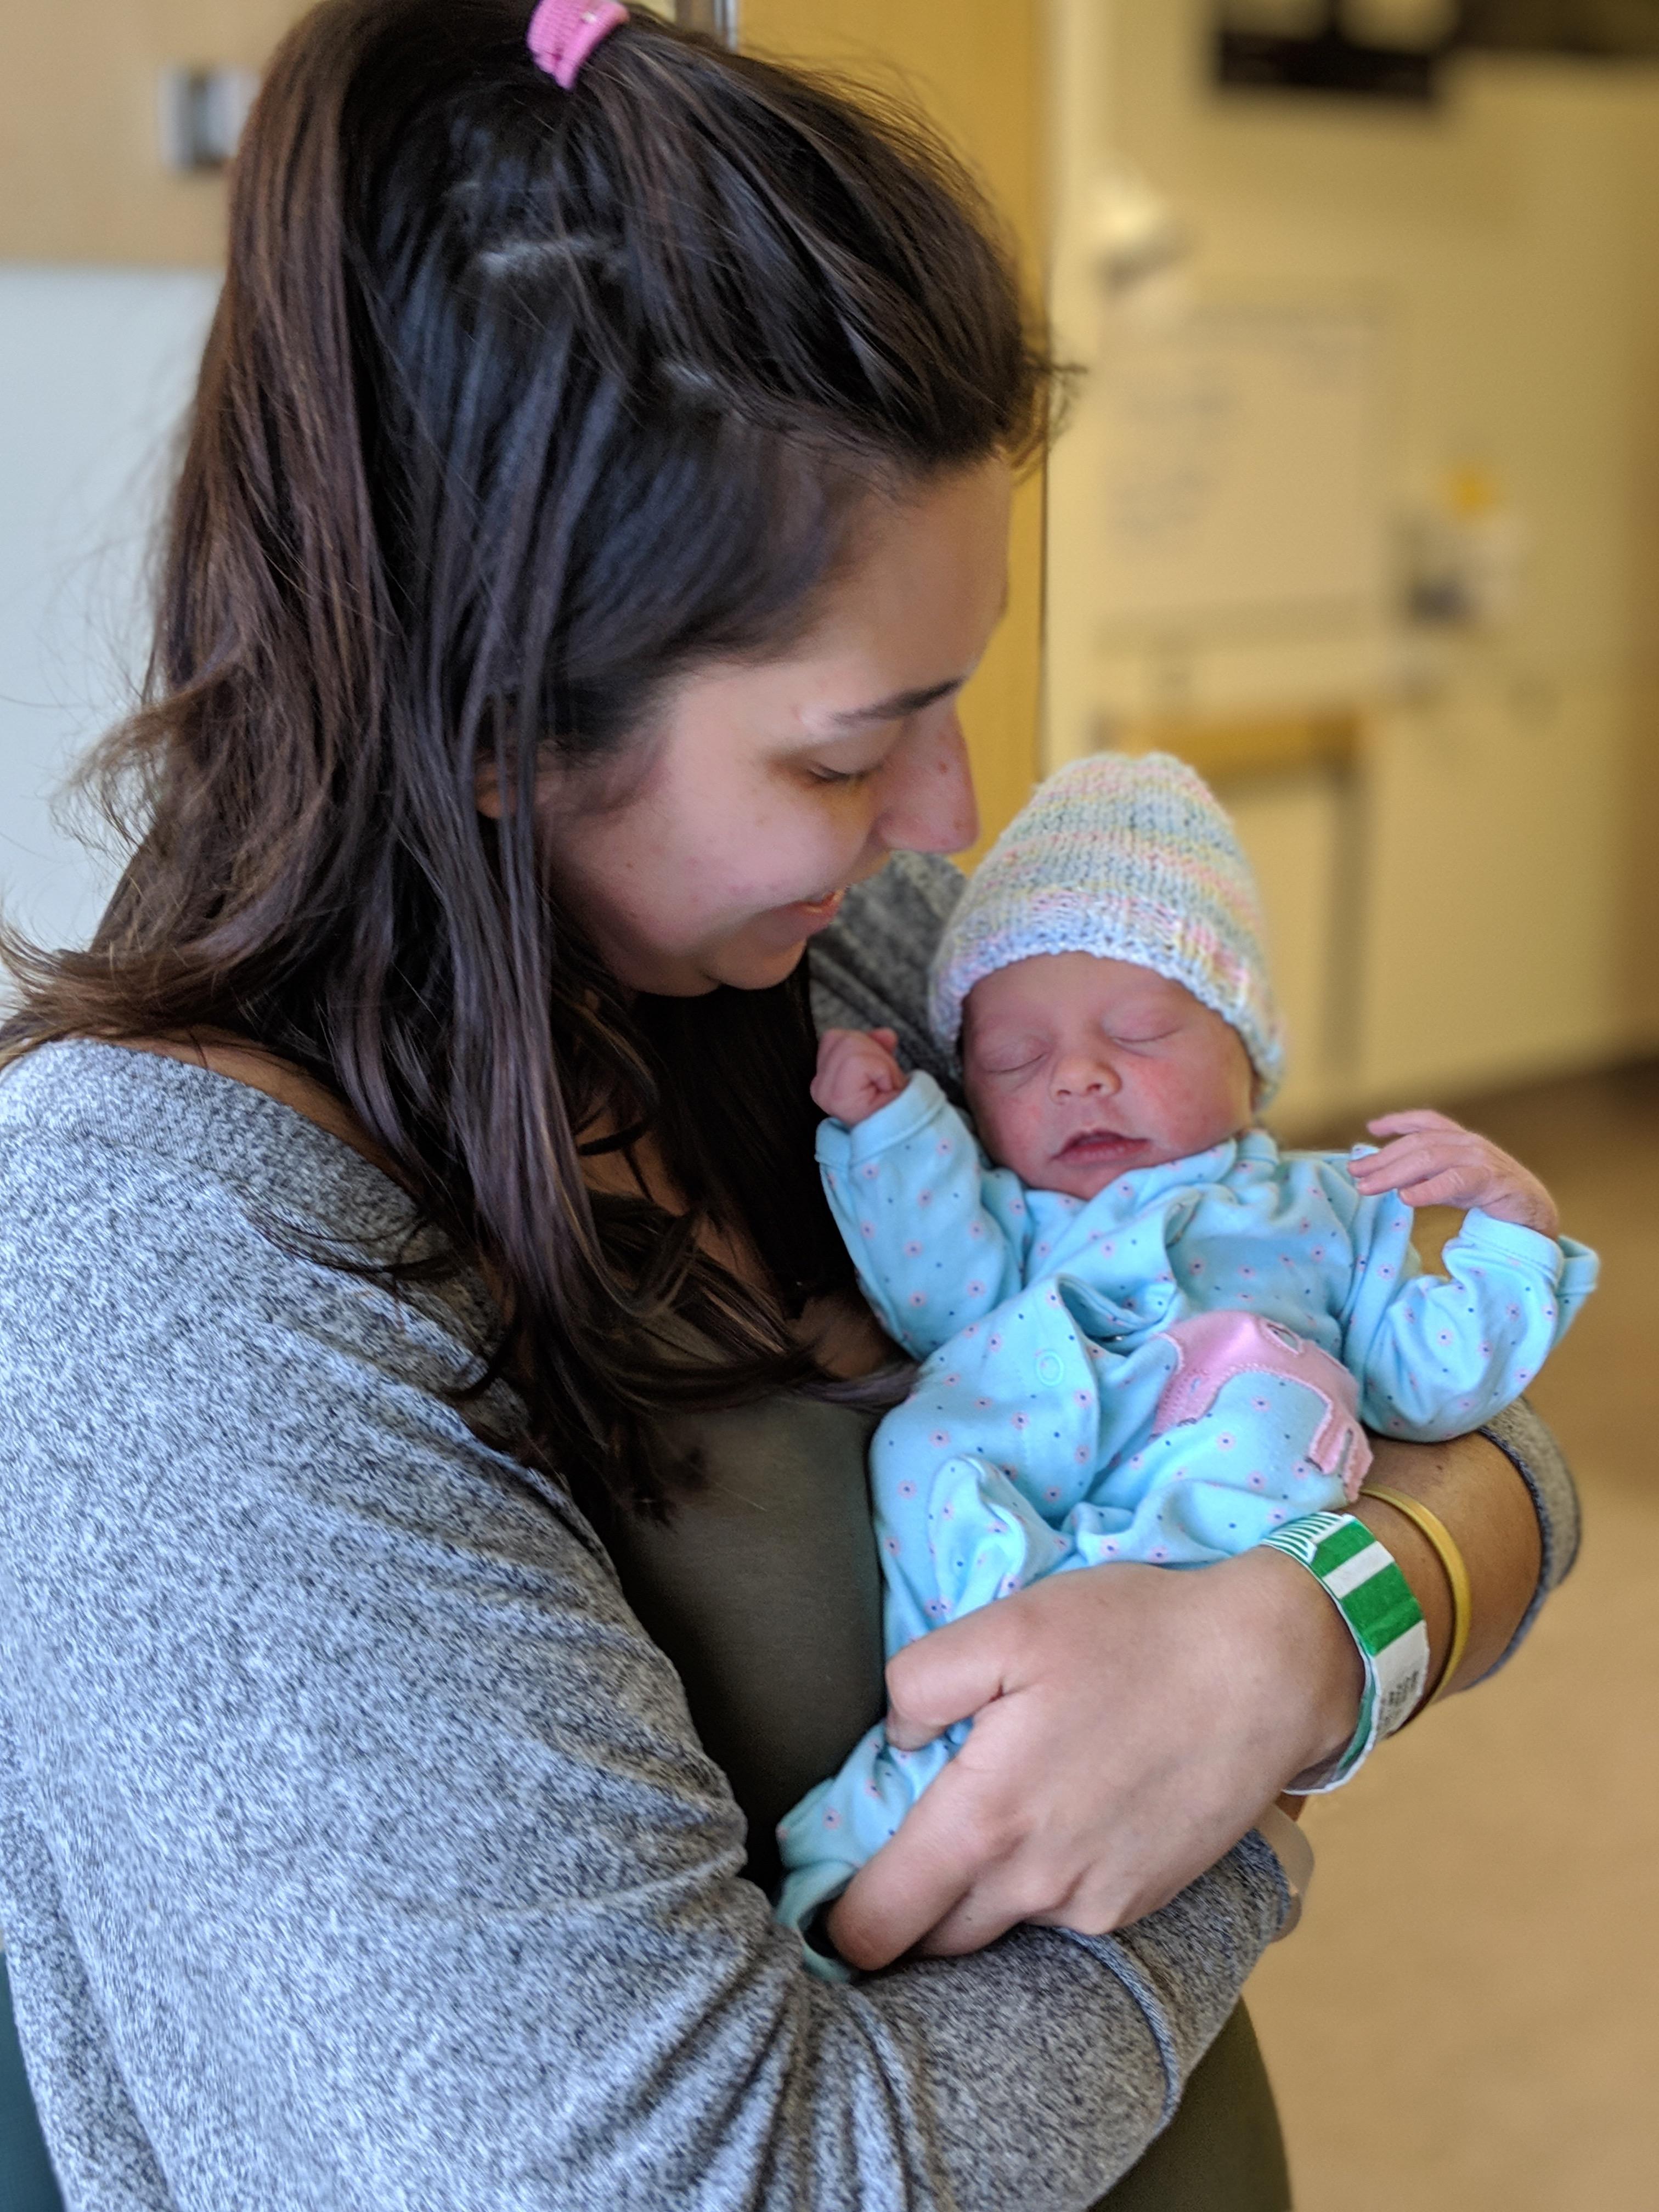 Jessica Conti, creator of Baby Basics